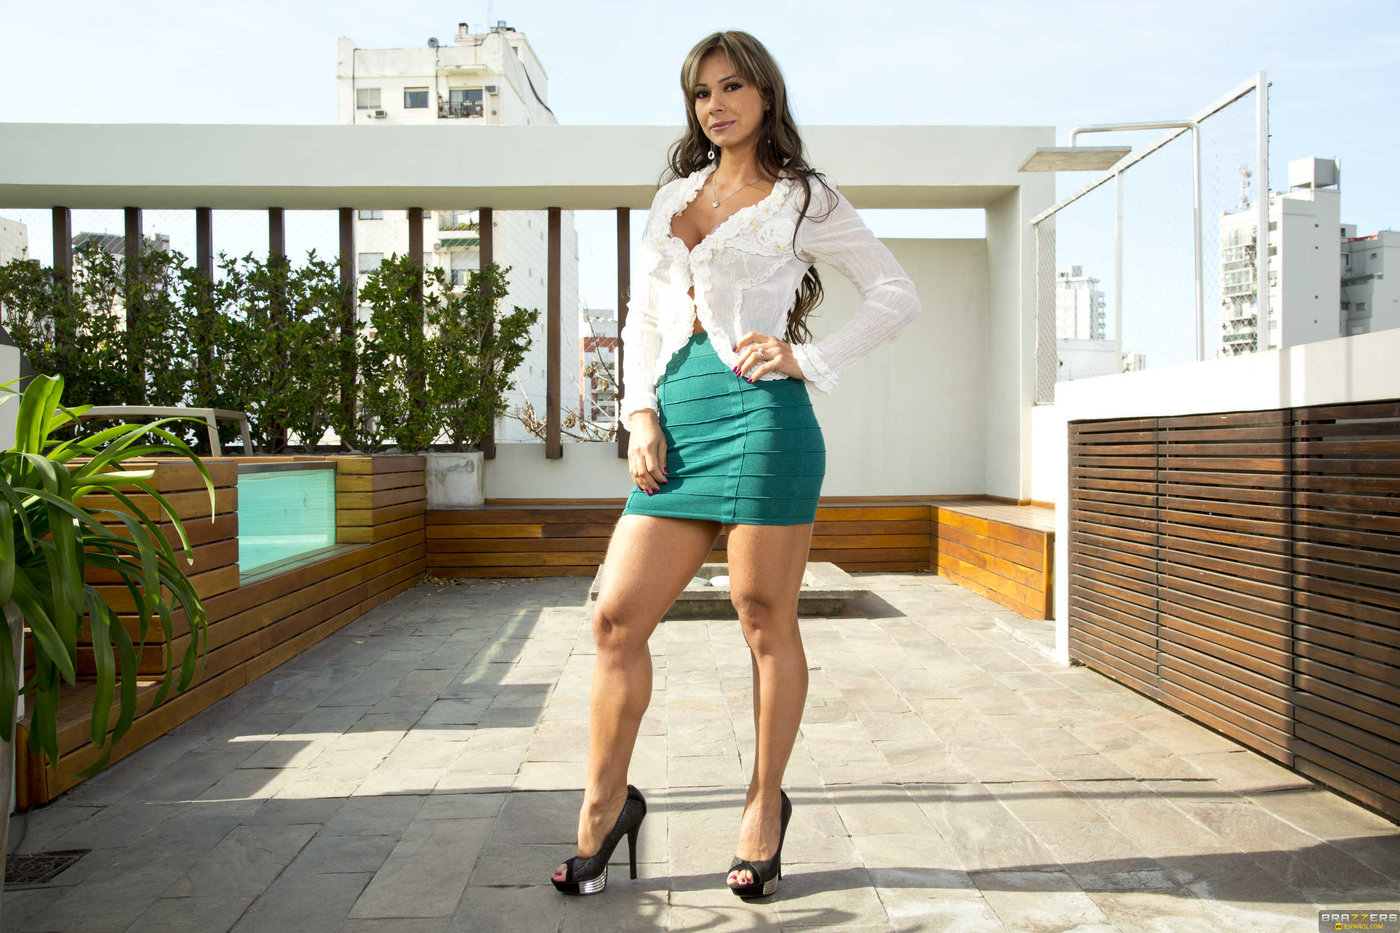 Ariella Ferrera - Huge Tits MILF Porn Babe 209 Links